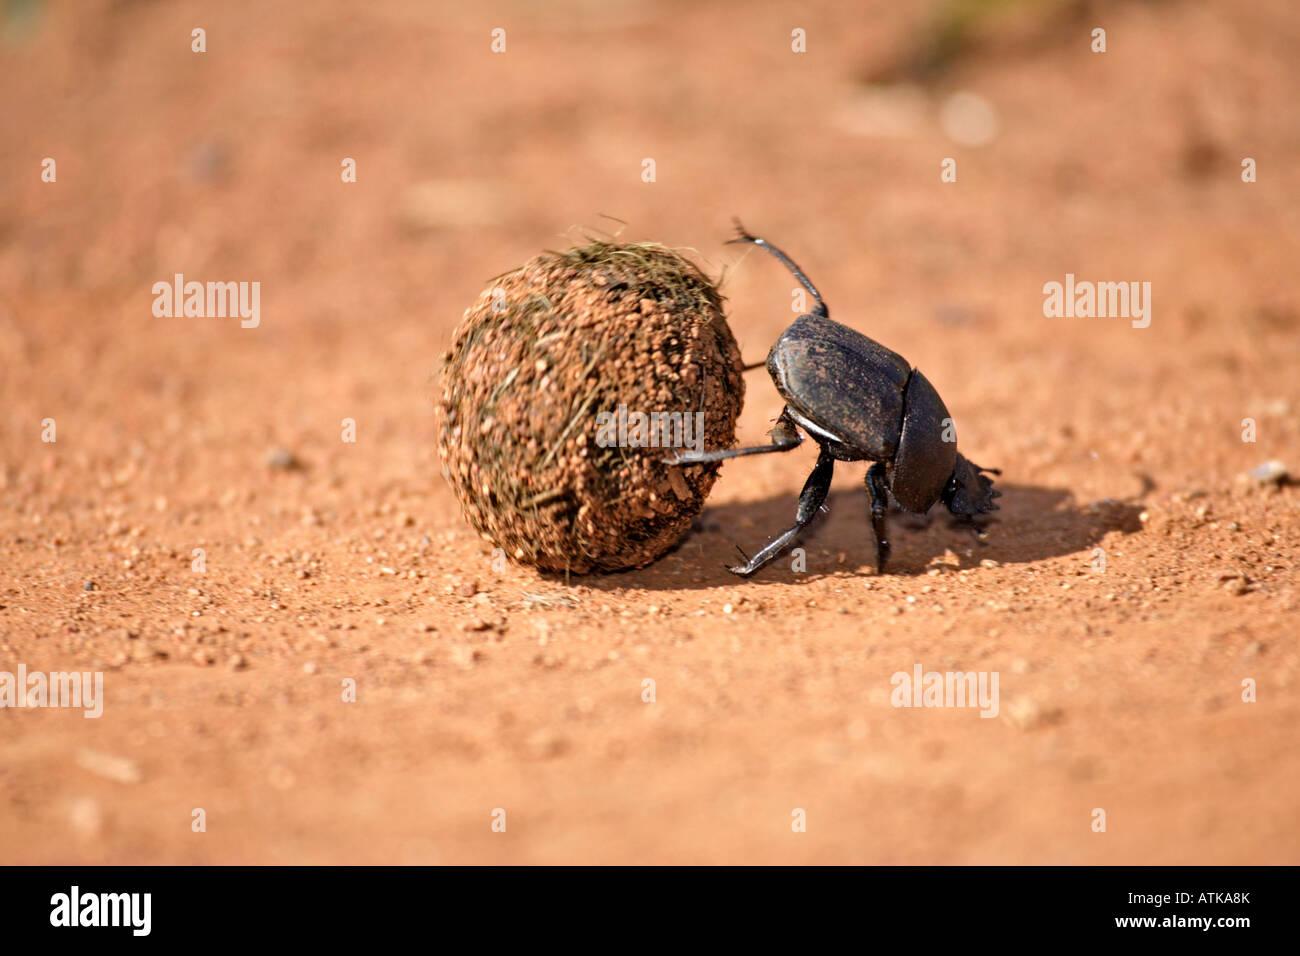 Dung Beetle / Scarabeo Scarabeo Foto Stock